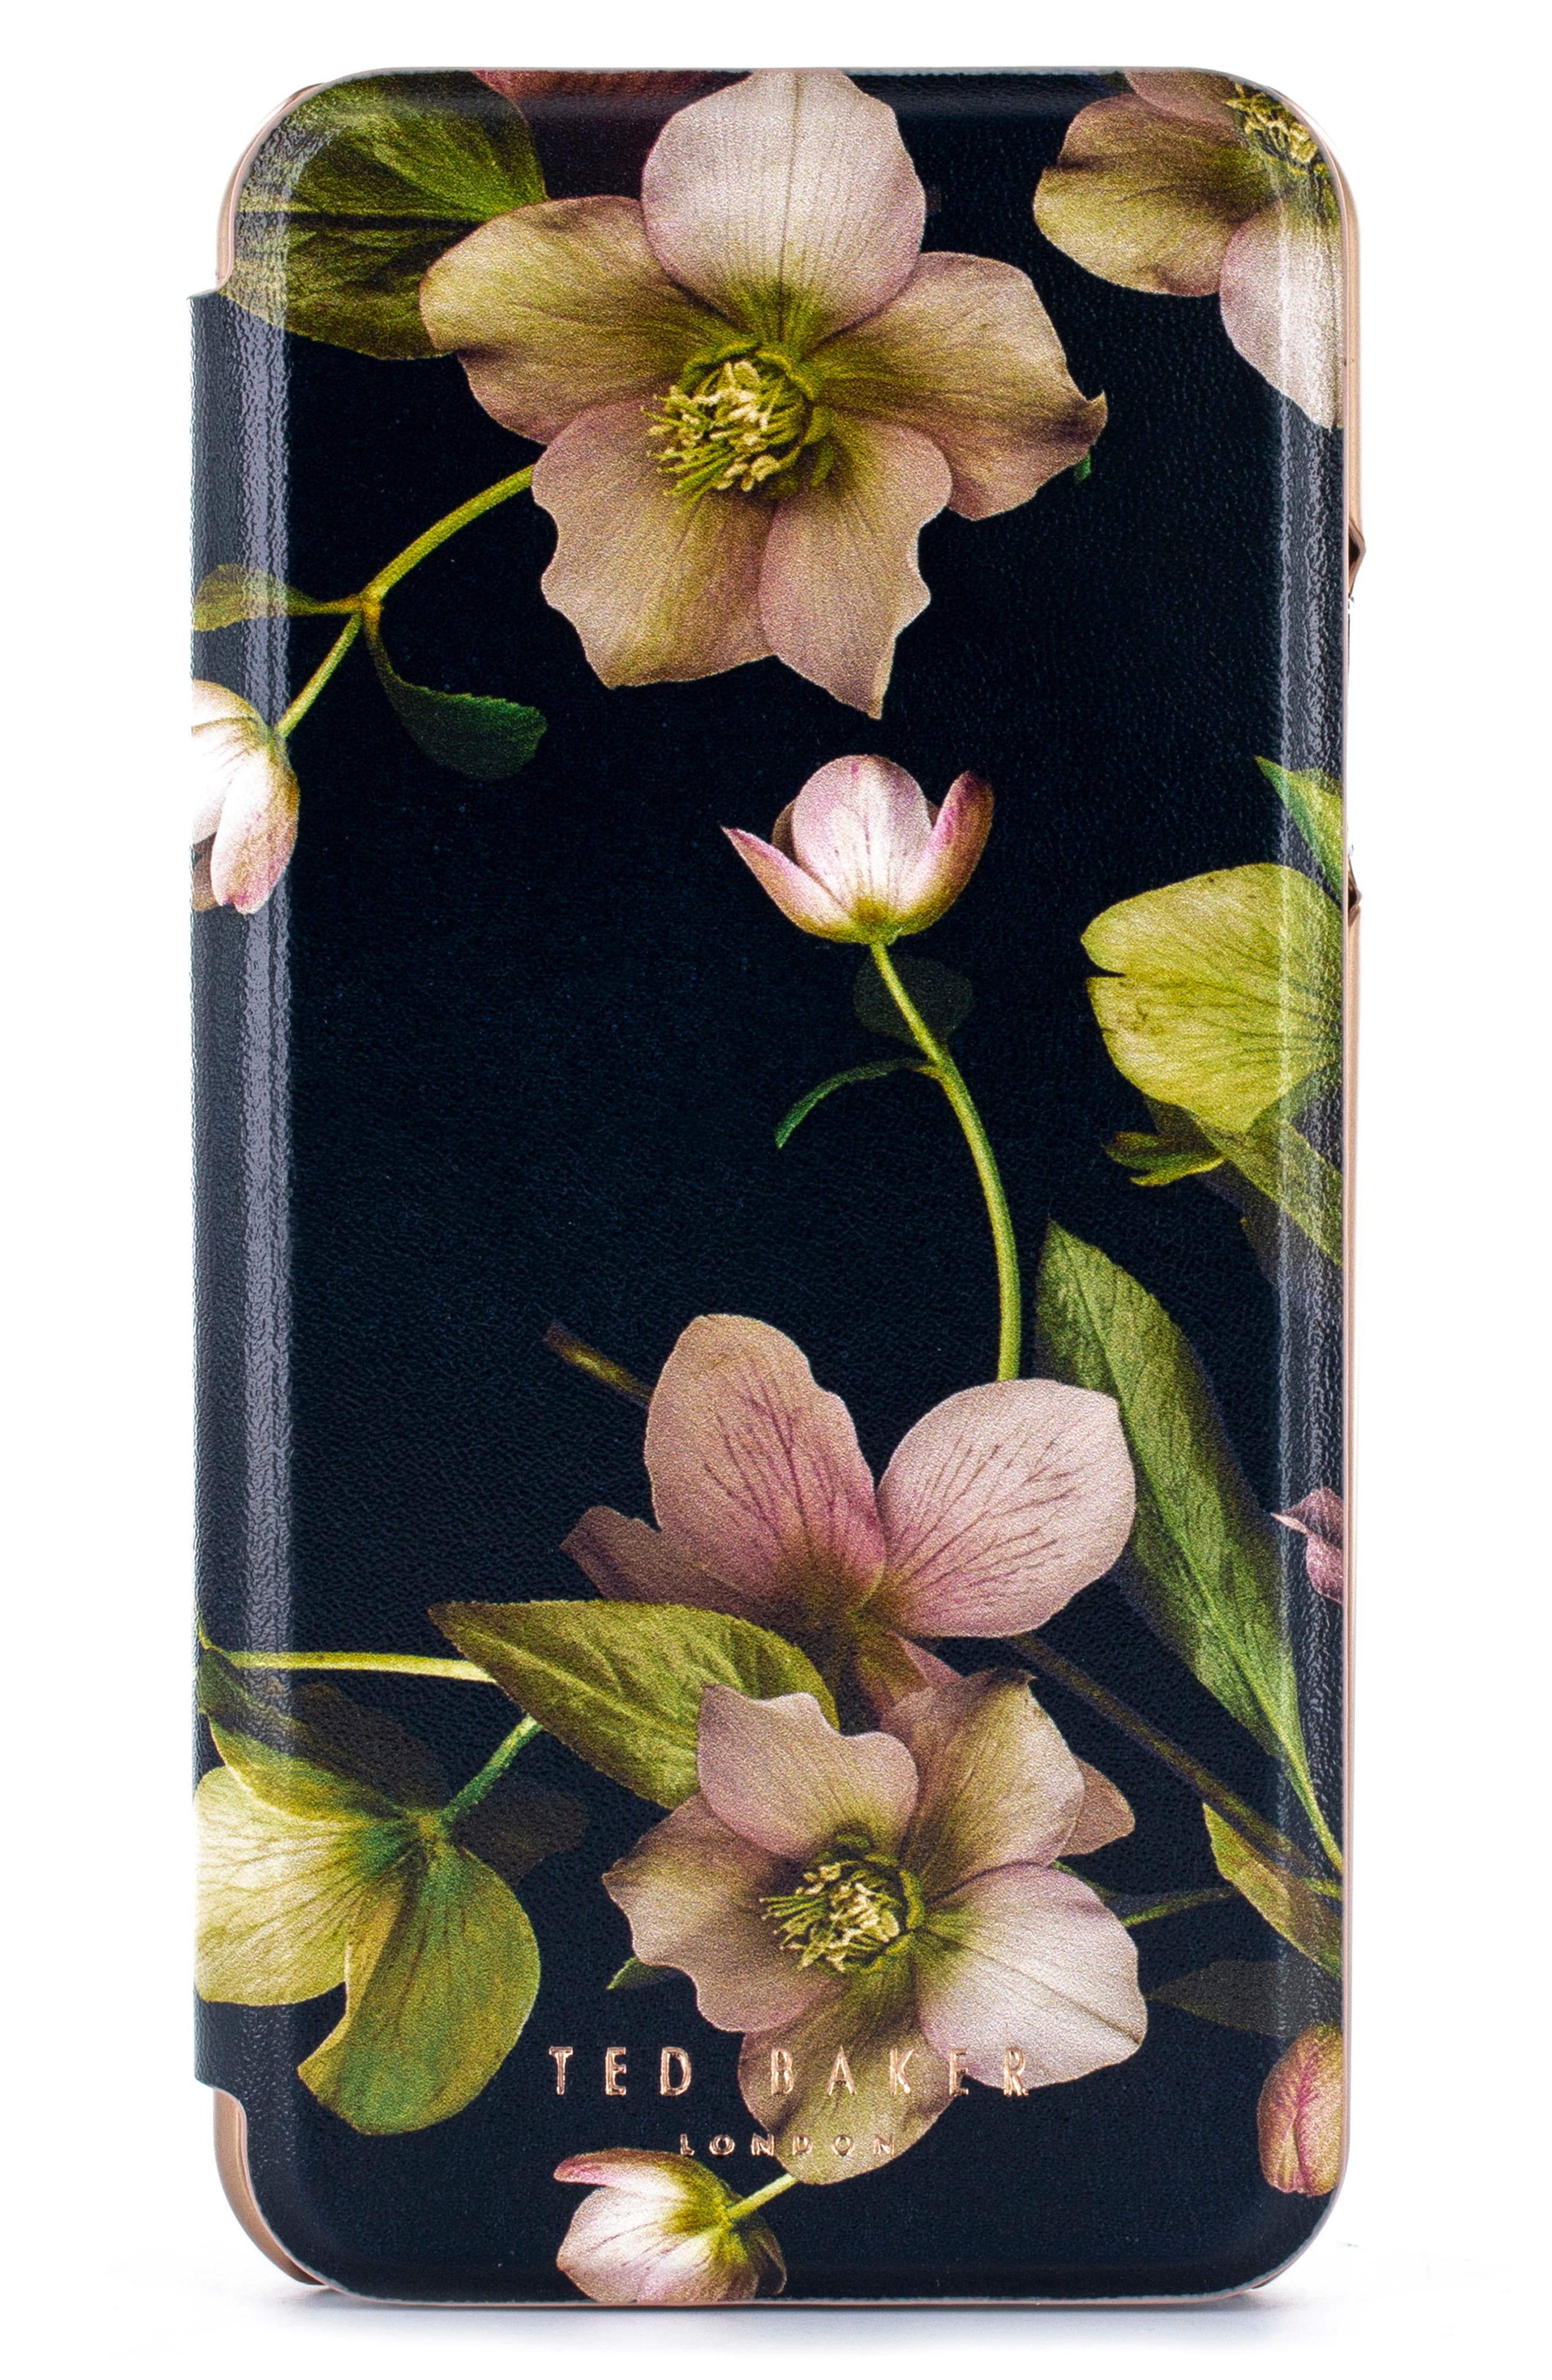 TED BAKER LONDON,                             Arboretum iPhone X/Xs/Xs Max & XR Mirror Folio Case,                             Main thumbnail 1, color,                             BLACK